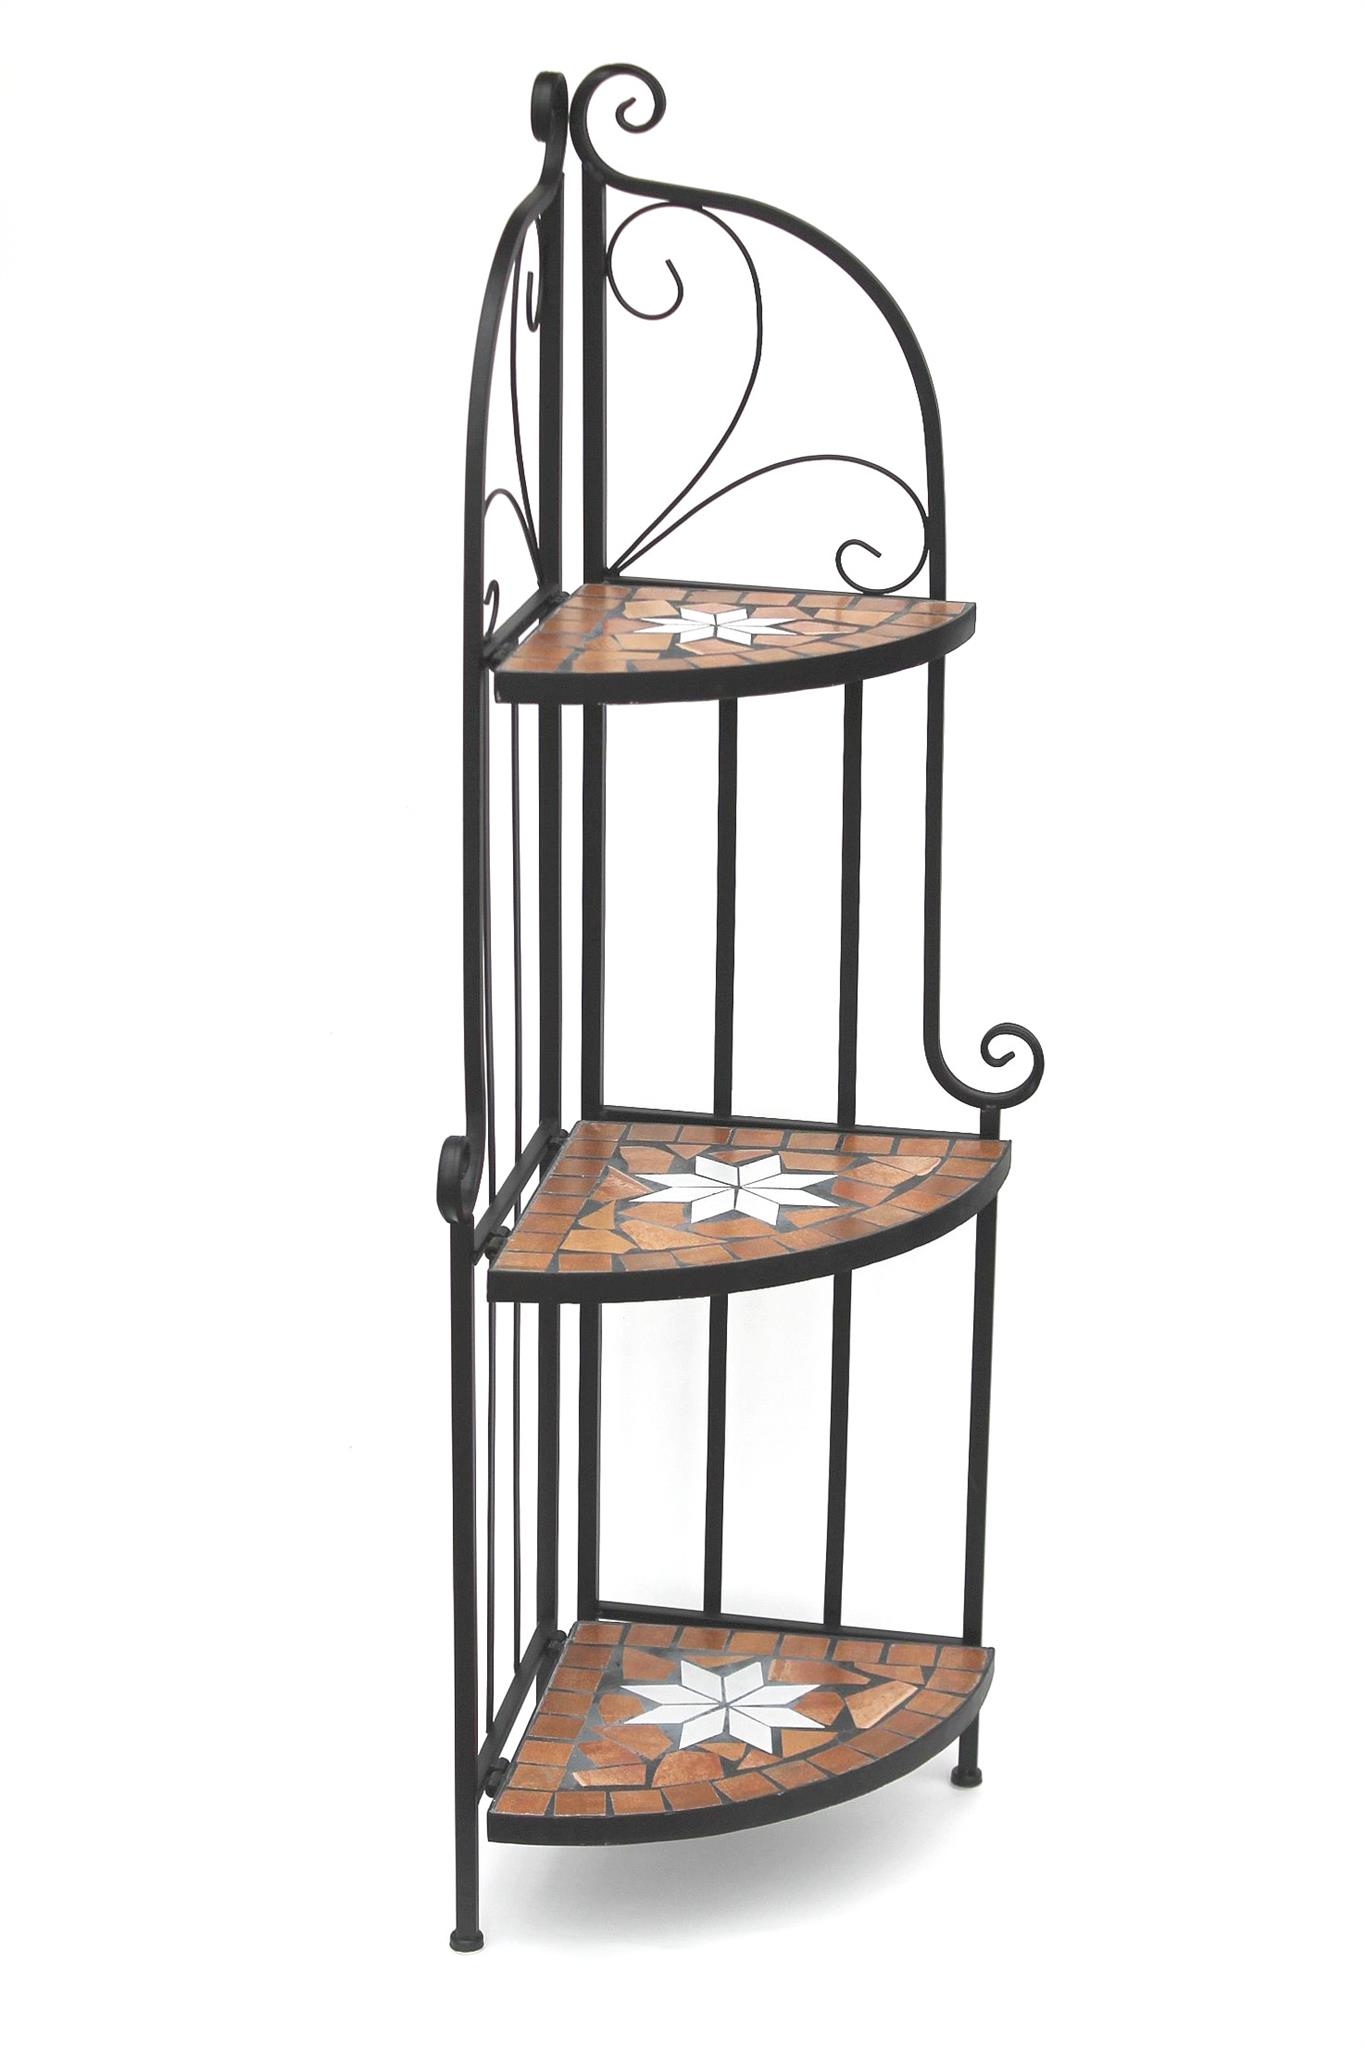 eckregal mosaik merano 12005 b cherregal 114 cm aus metall schmiedeeisen regal ebay. Black Bedroom Furniture Sets. Home Design Ideas